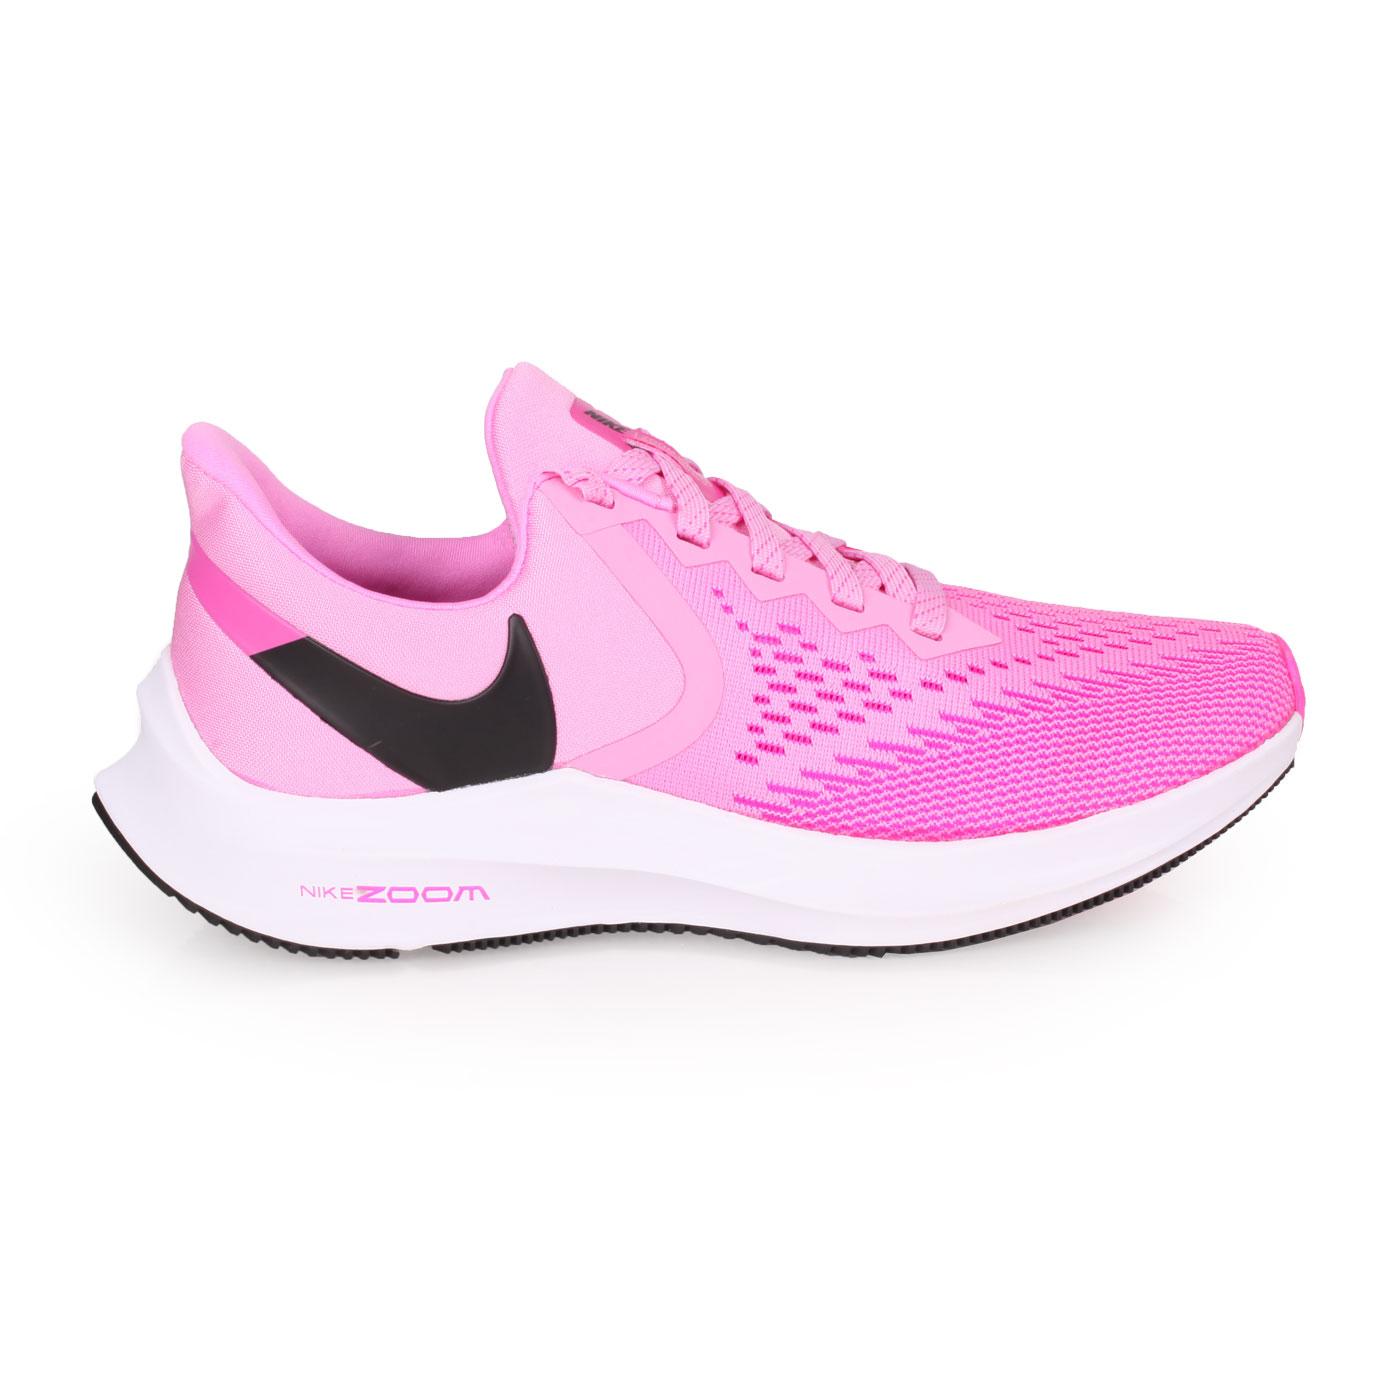 NIKE 女款慢跑鞋  @WMNS ZOOM WINFLO 6@AQ8228600 - 桃紅黑